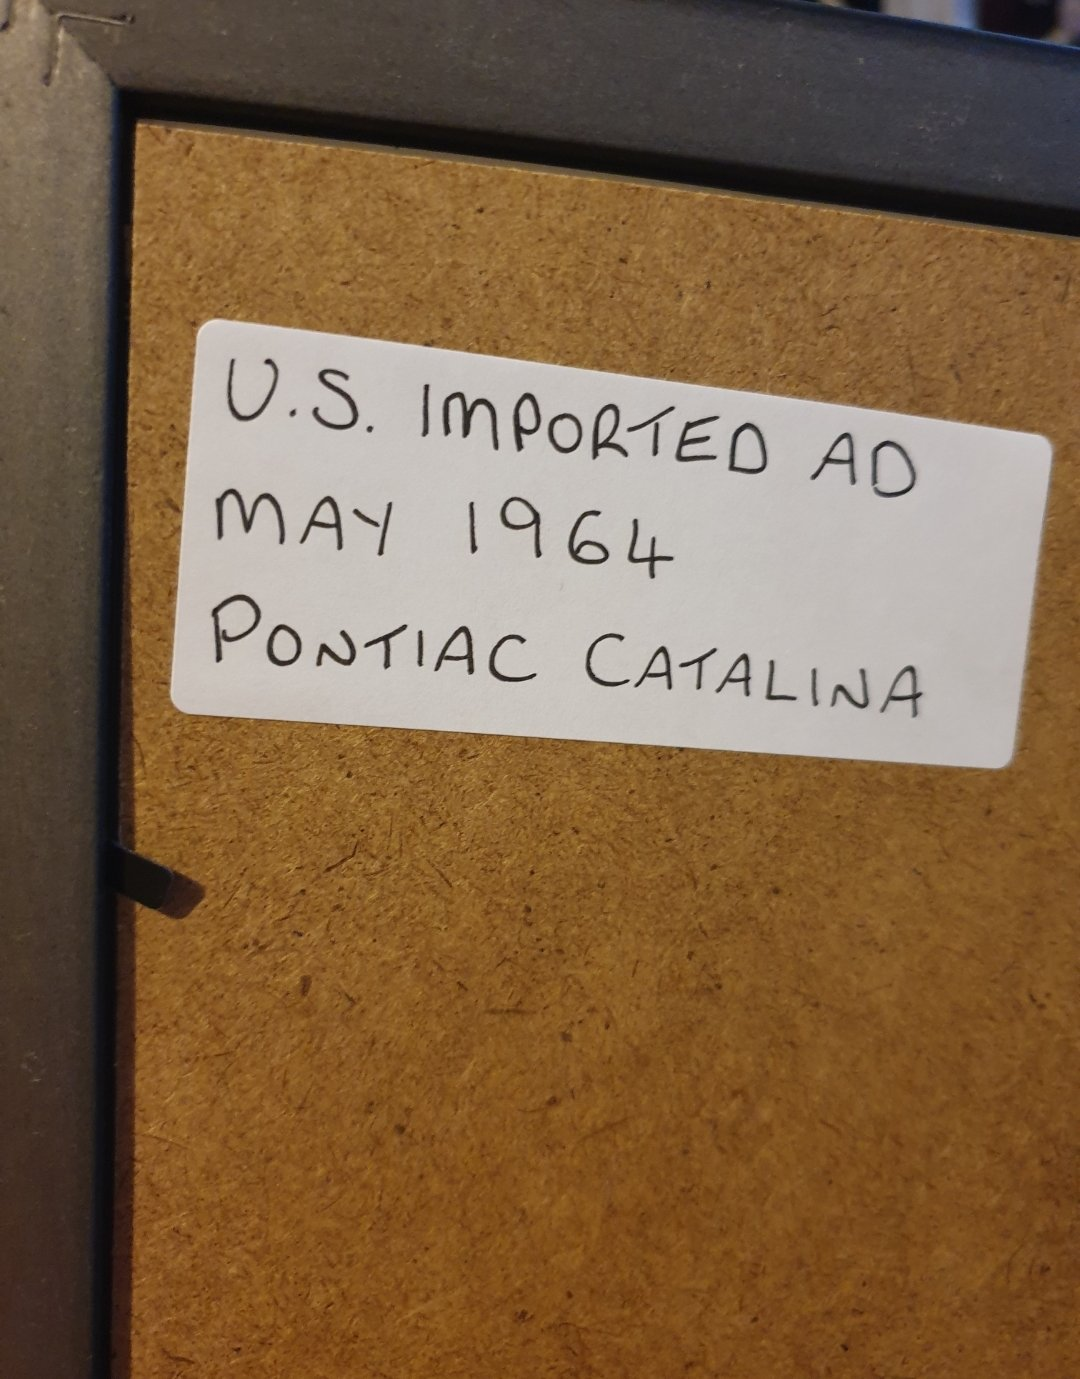 1964 Pontiac Catalina Advert Original  For Sale (picture 2 of 2)